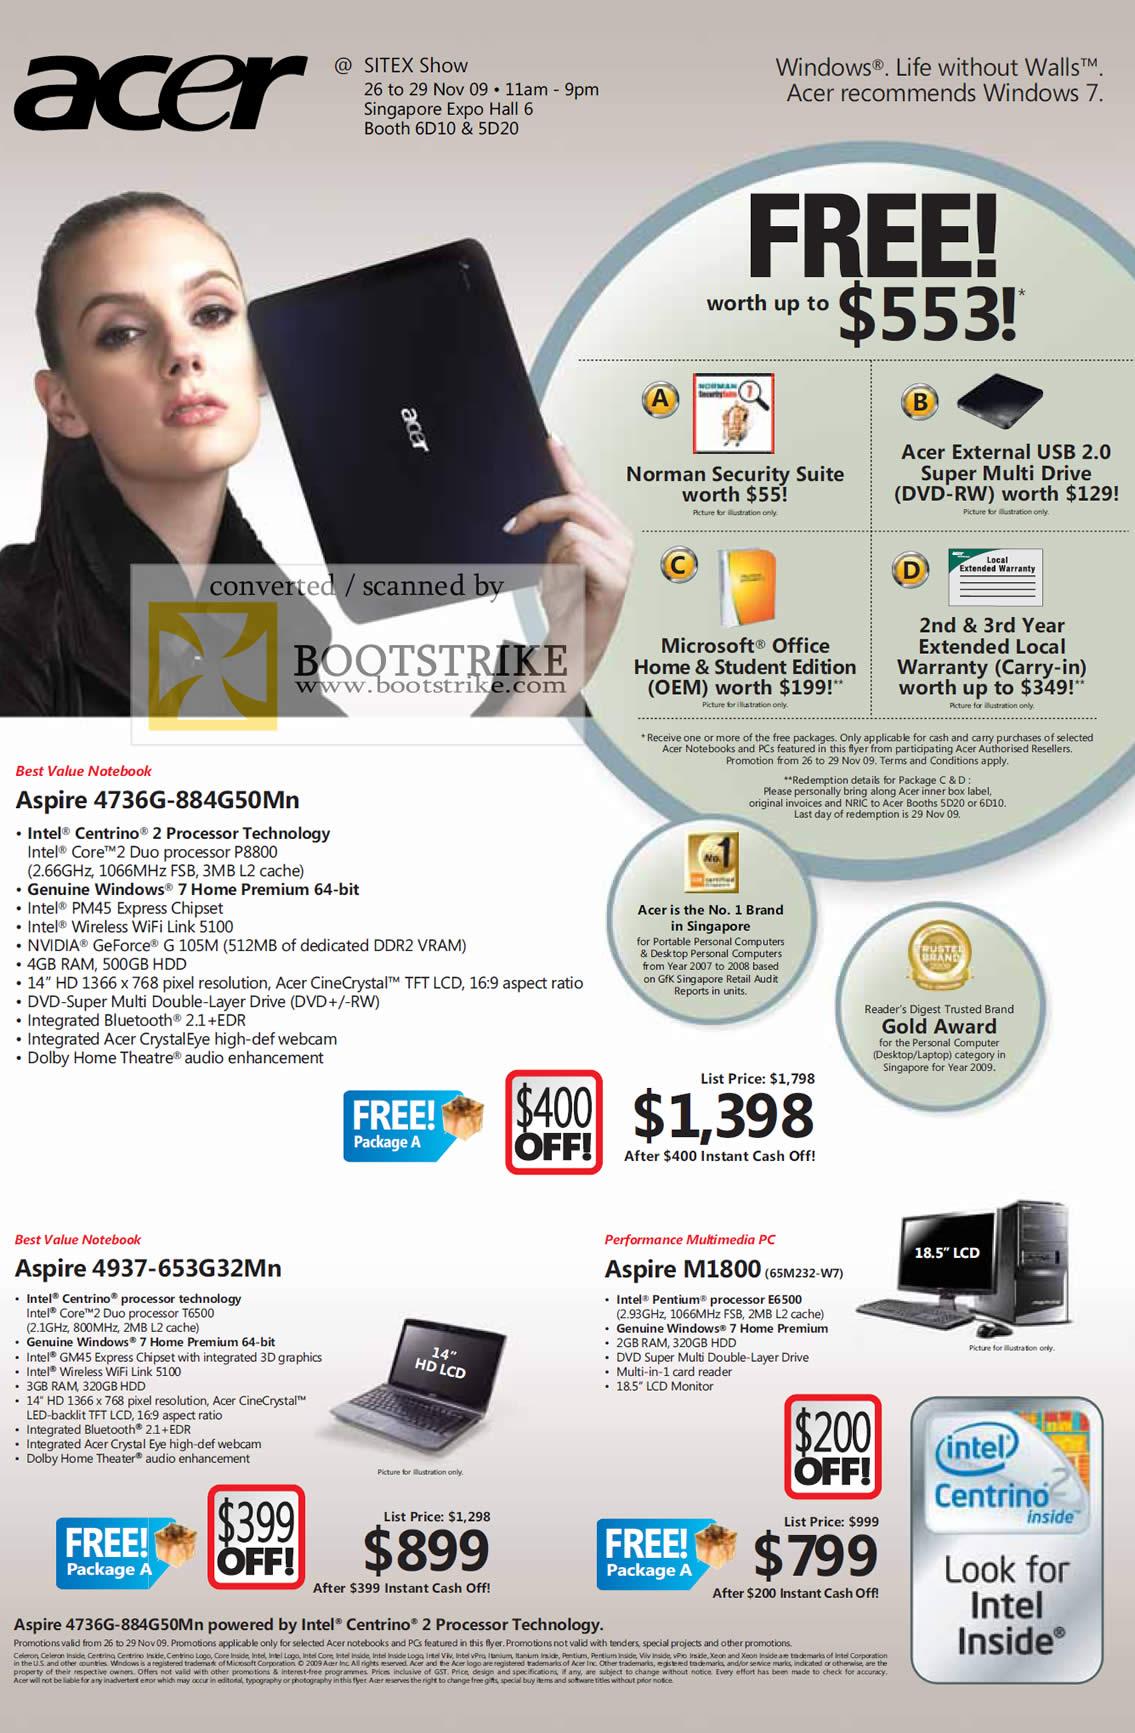 Sitex 2009 price list image brochure of Acer Aspire 4736G 4937 M1800 Notebook Desktop PC